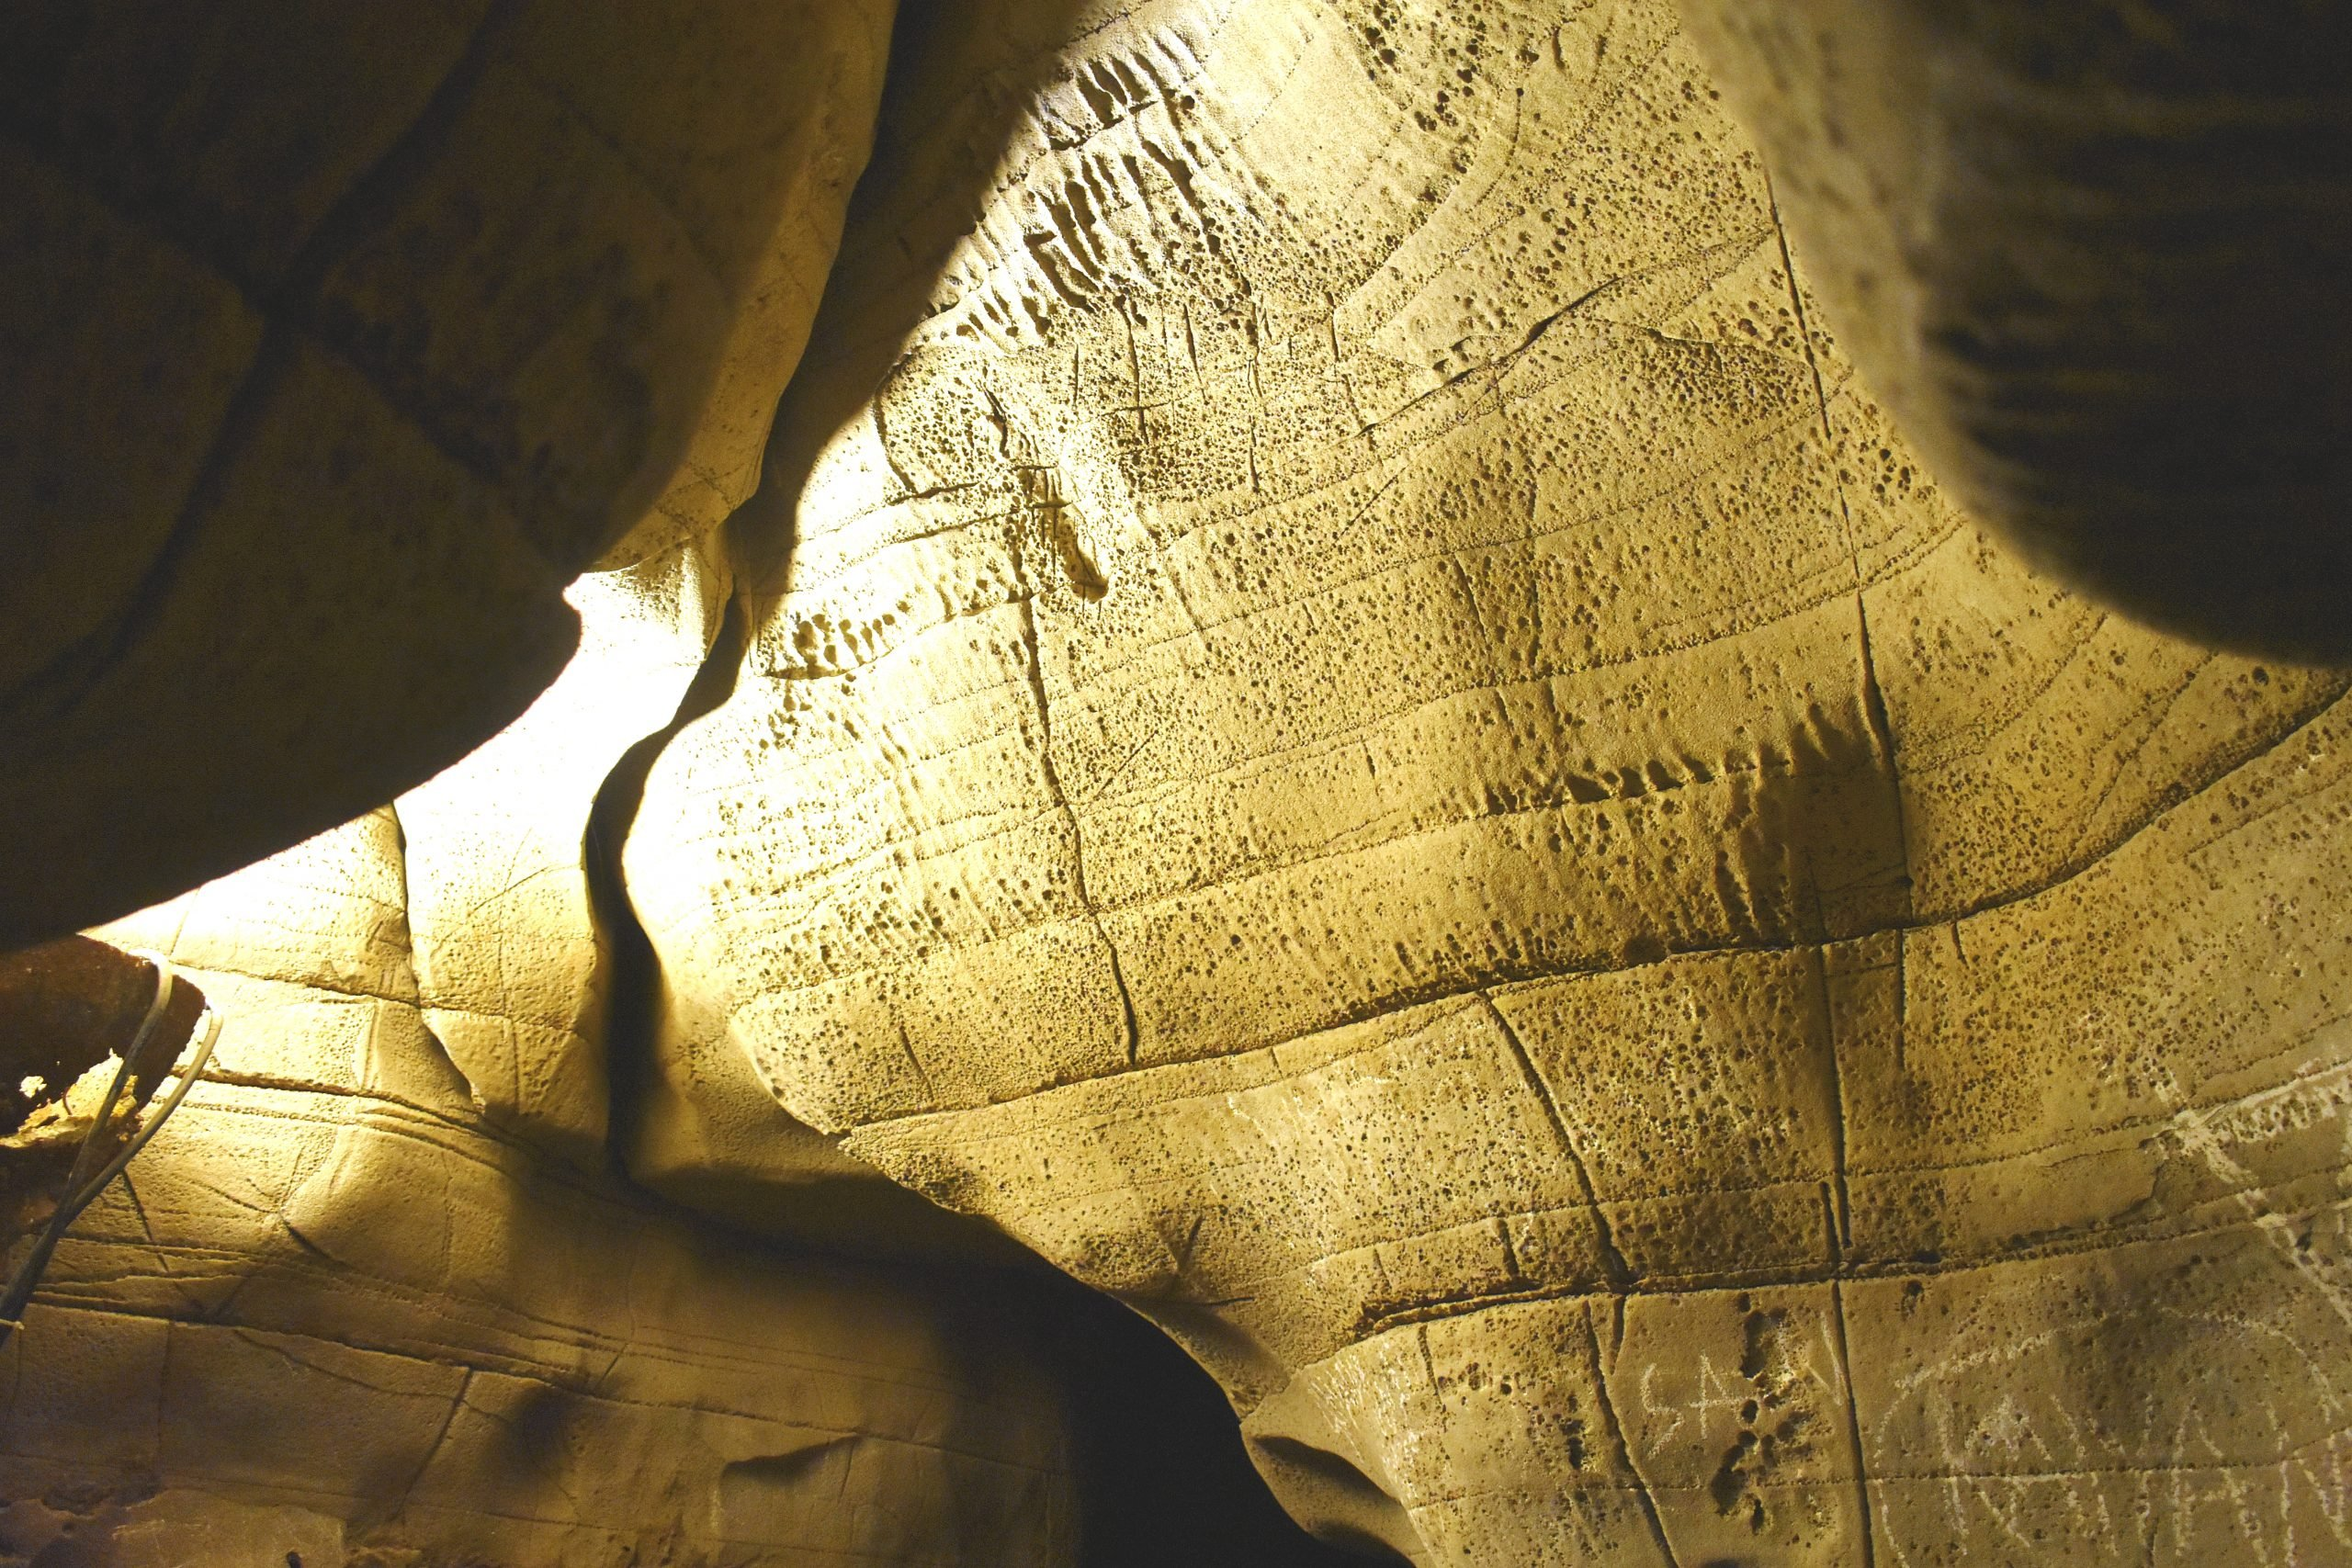 Rock texture inside a cave